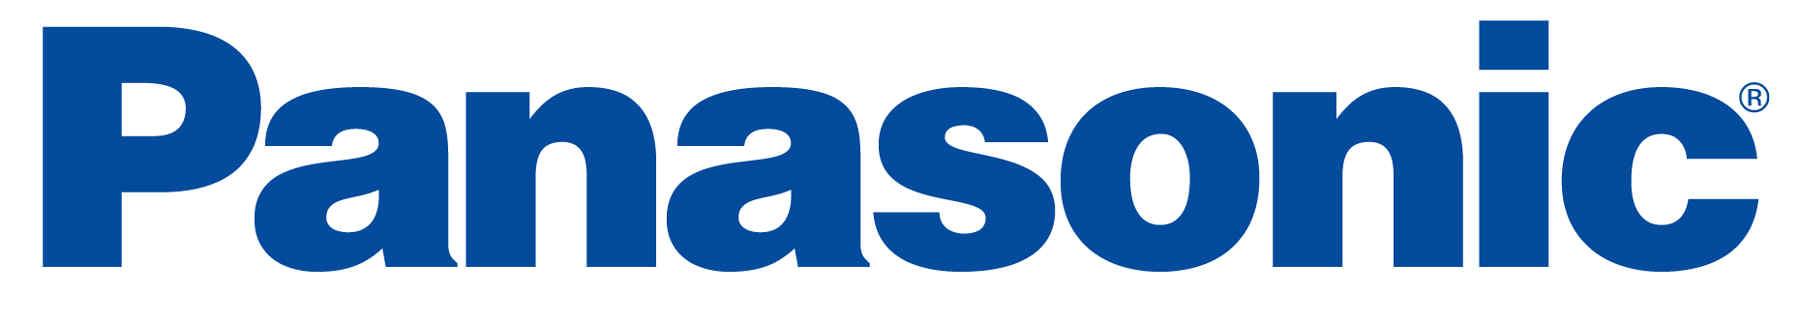 Summit Sponsor